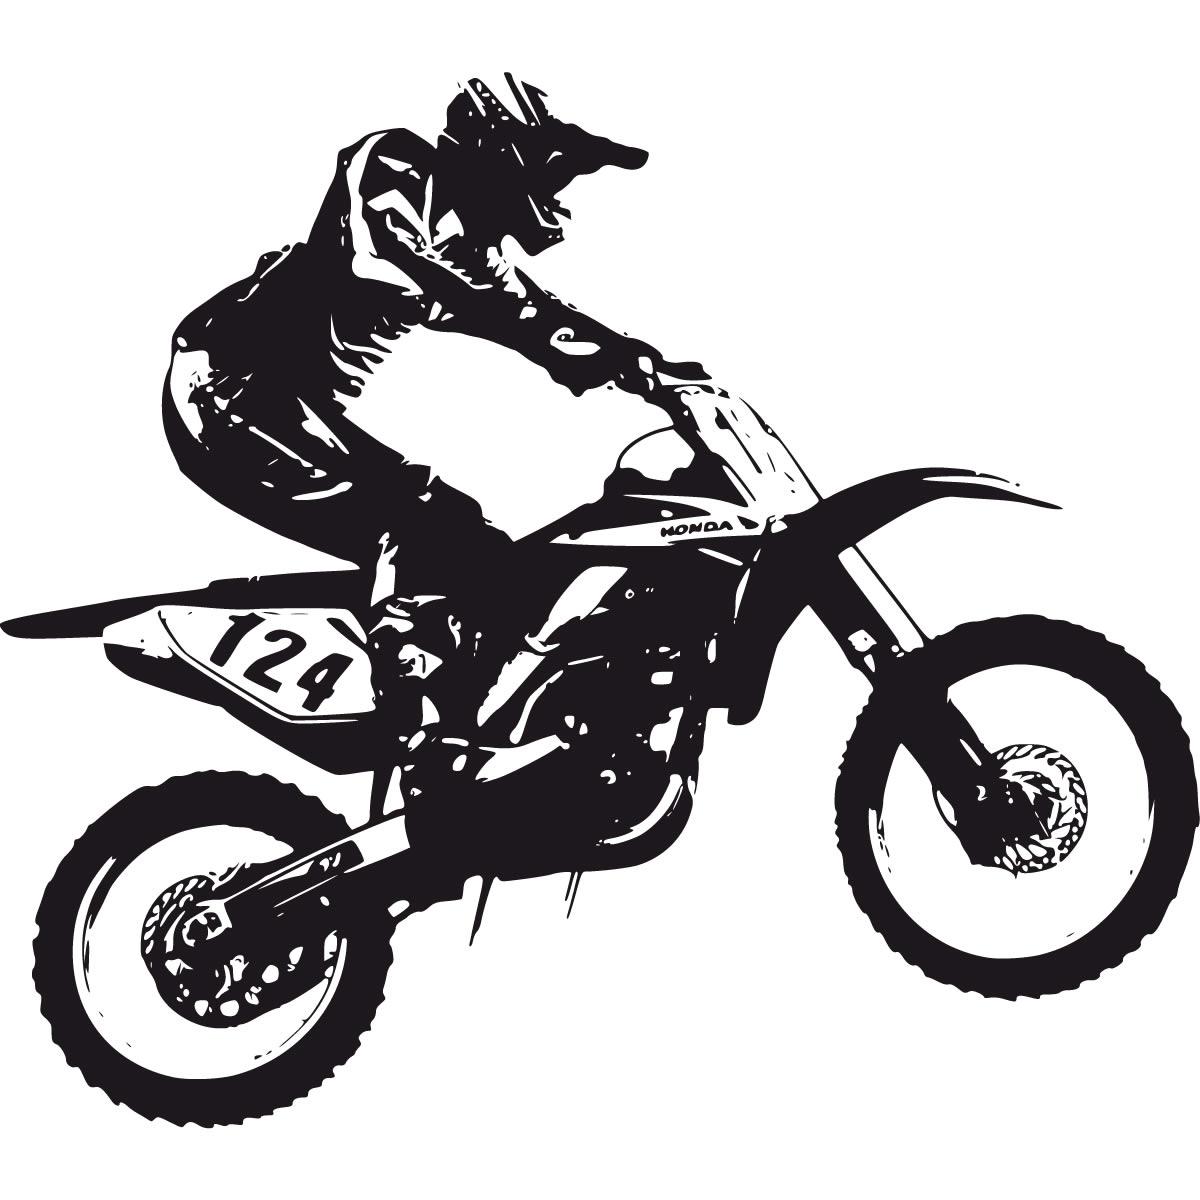 Motocross bike clipart banner free download 87+ Motocross Clipart   ClipartLook banner free download